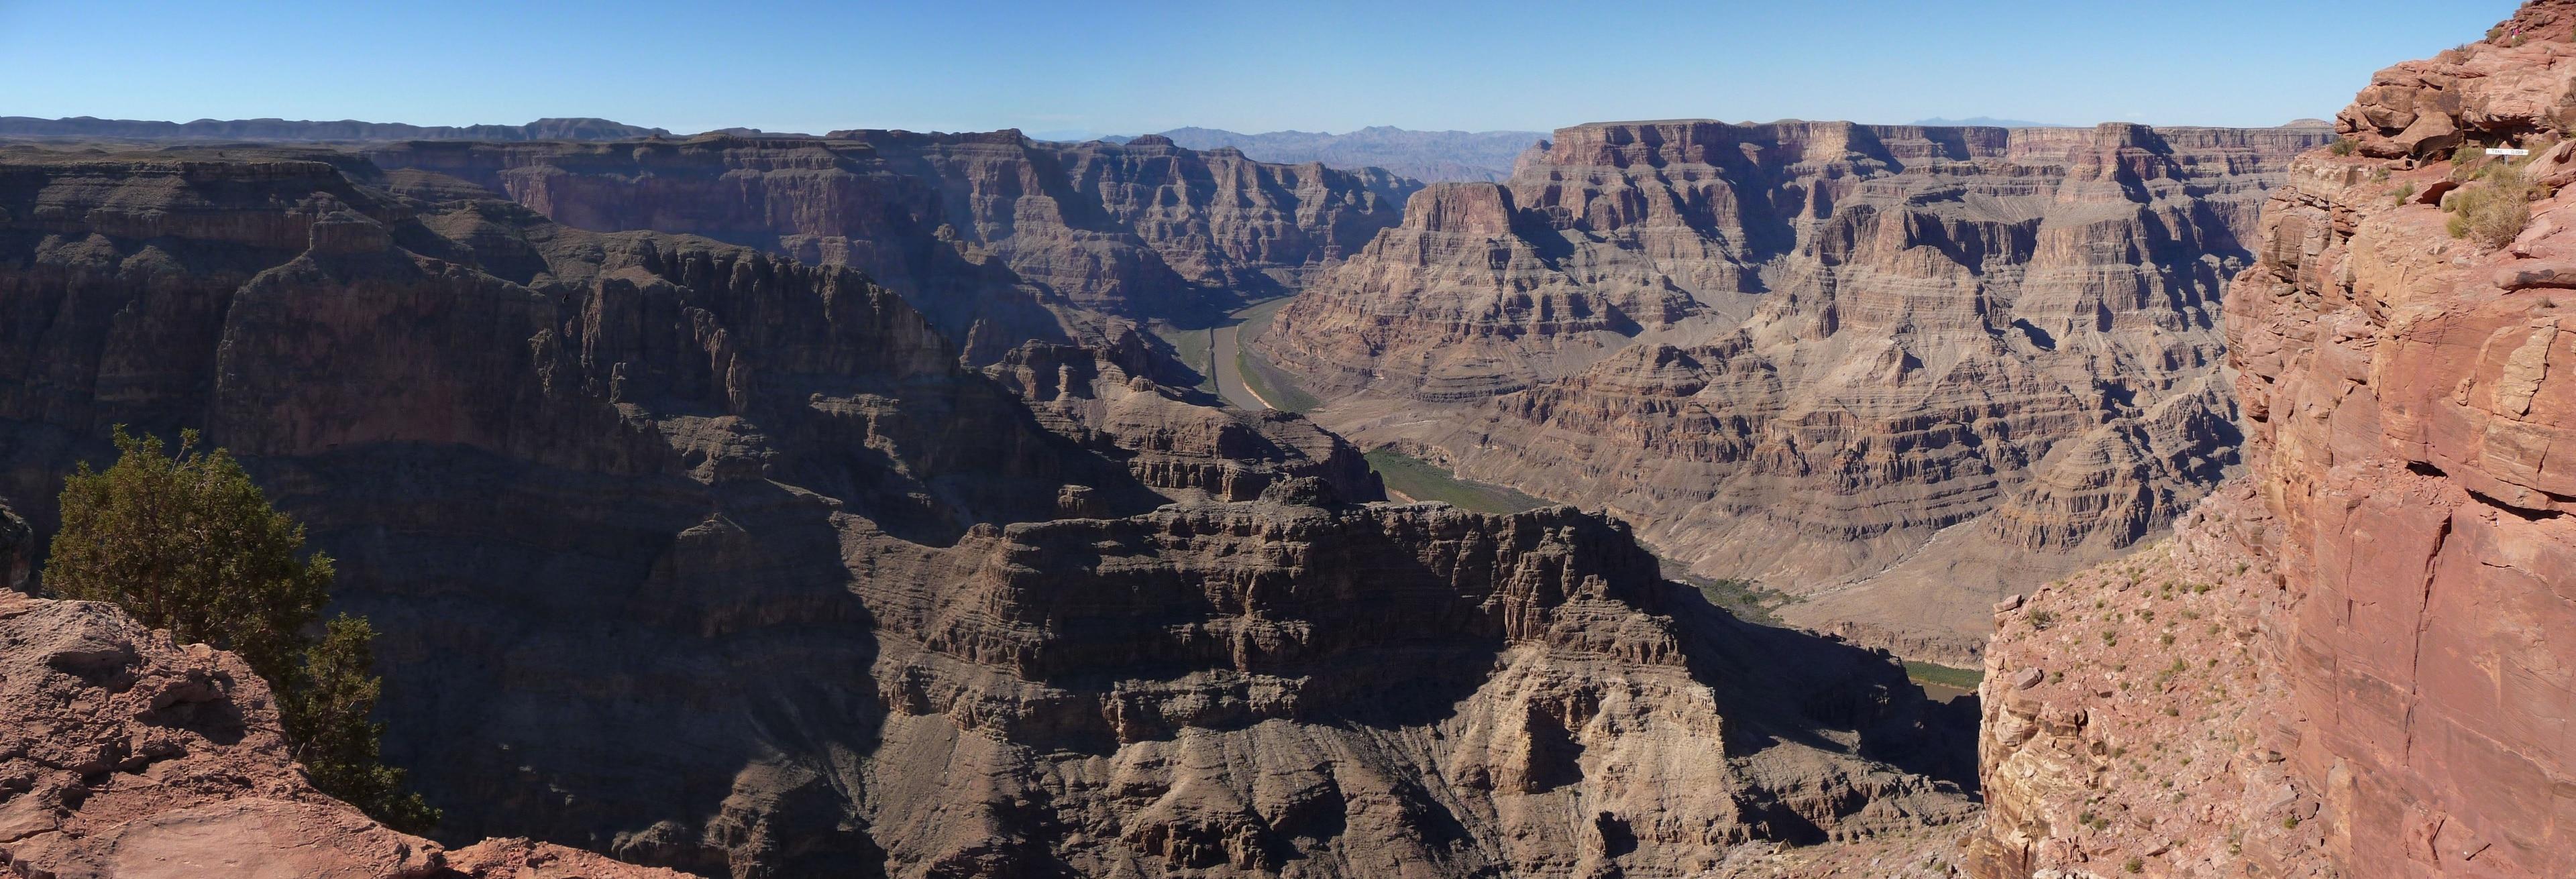 Grand Canyon National Park Us Vacation Rentals Cabin Rentals More Vrbo